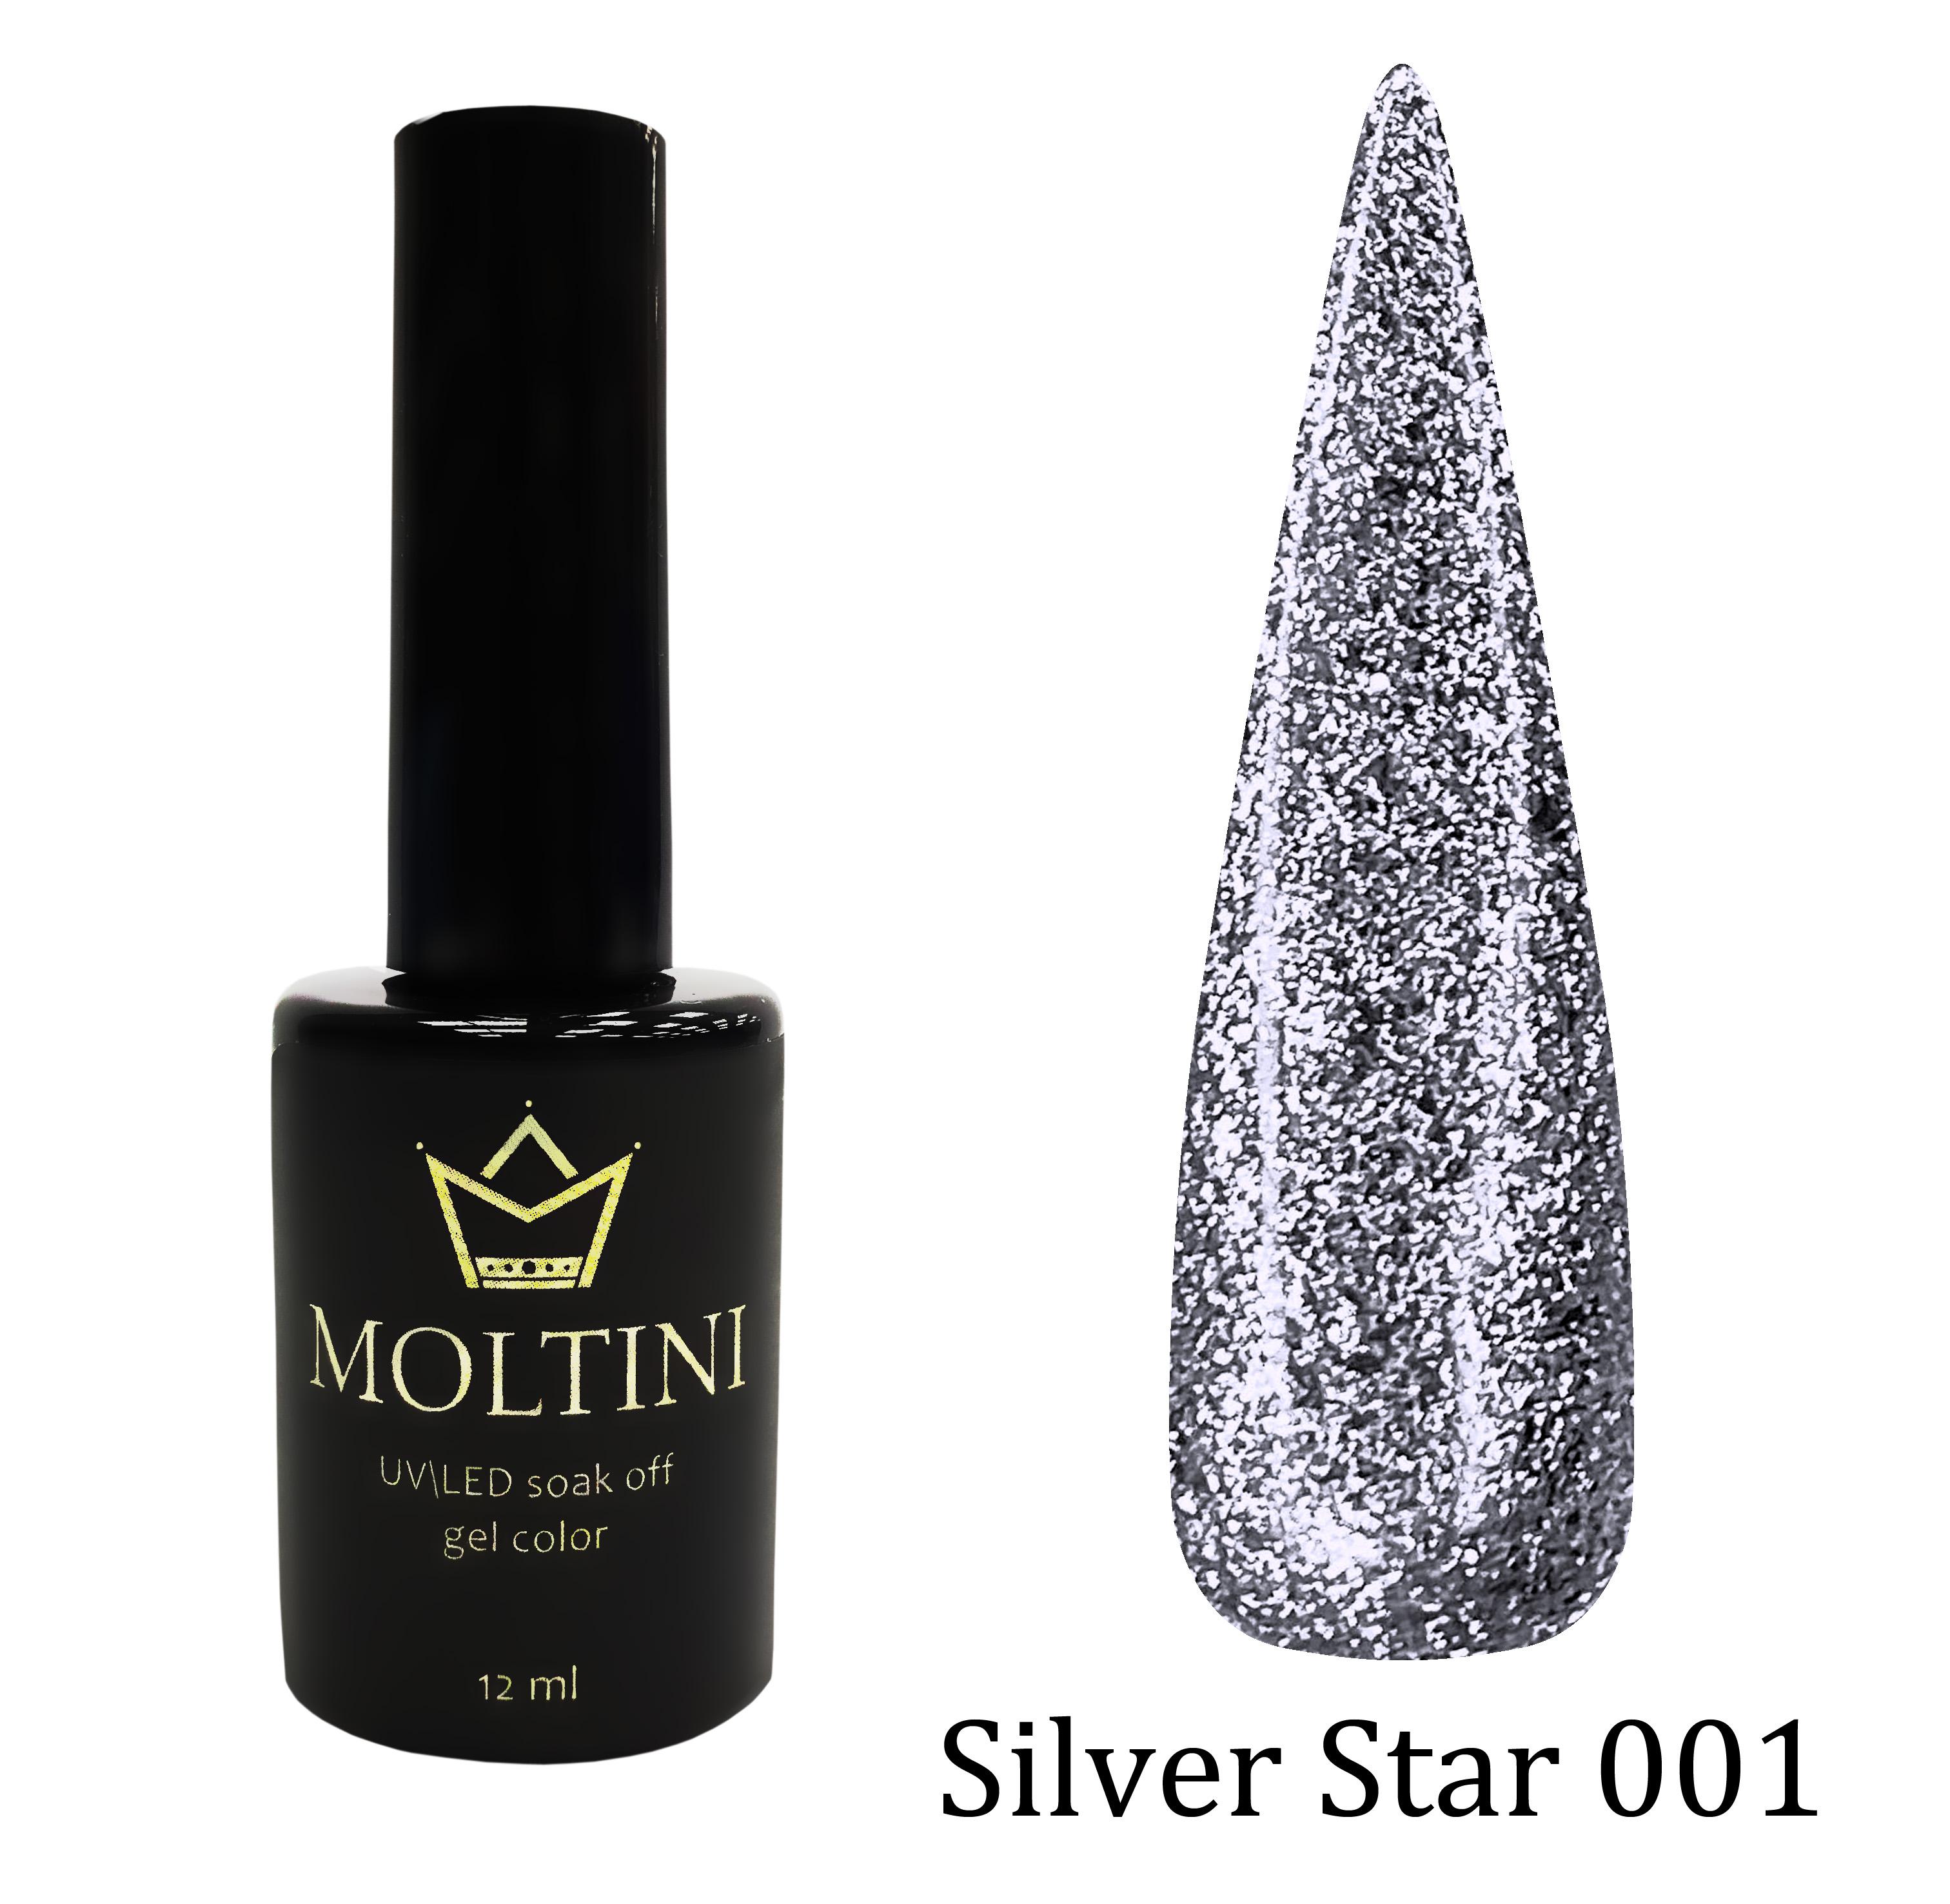 Гель-лак Moltini Silver Star 001, 12 ml